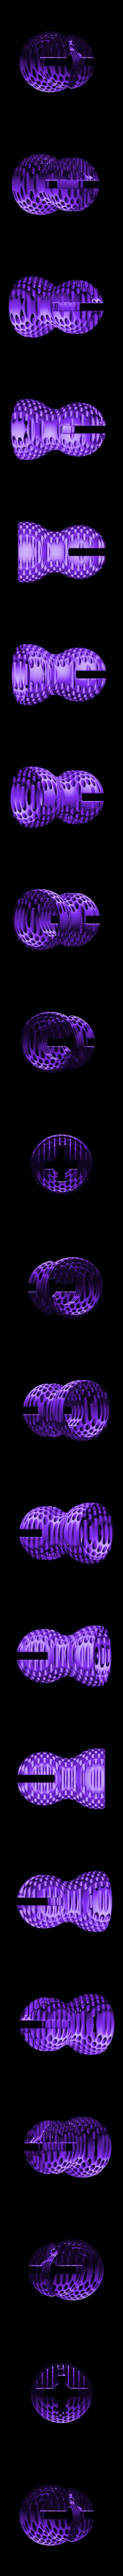 clips voronoi.stl Download free STL file clips or joints for free creation • 3D print design, juanpix